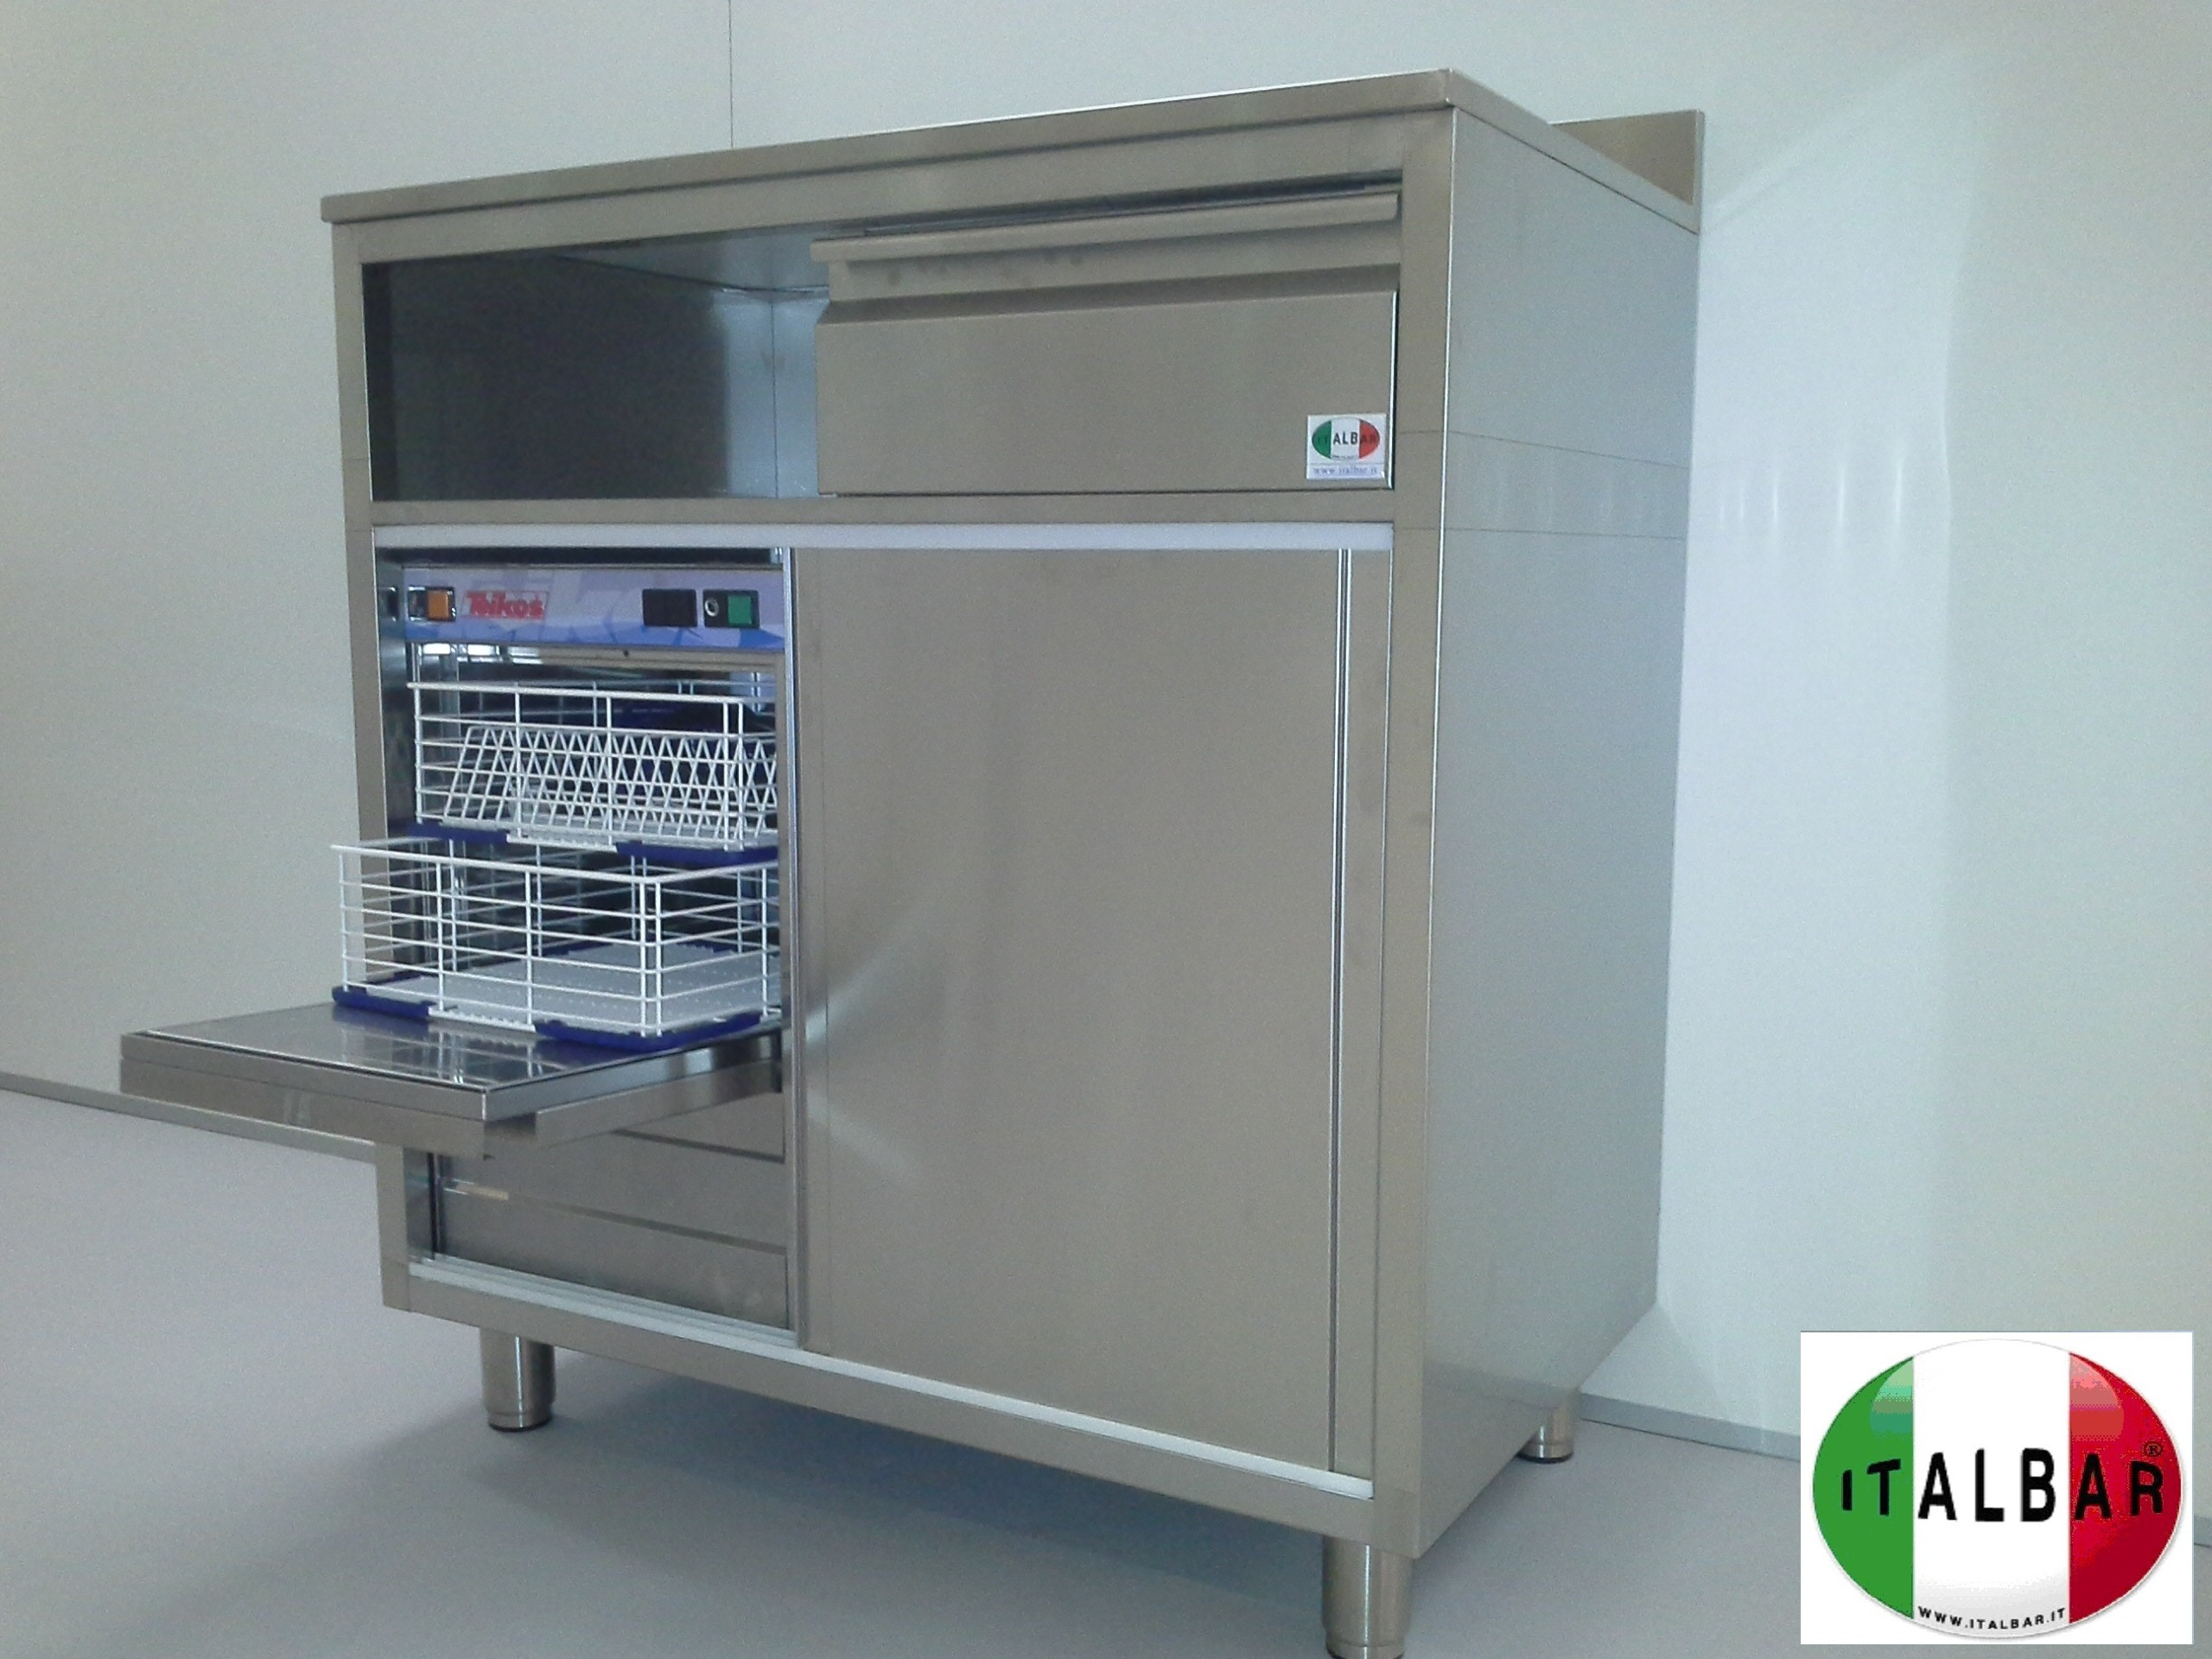 Banchi refrigerati banchi bar banconi bar produttori di for Arredamenti bar torino